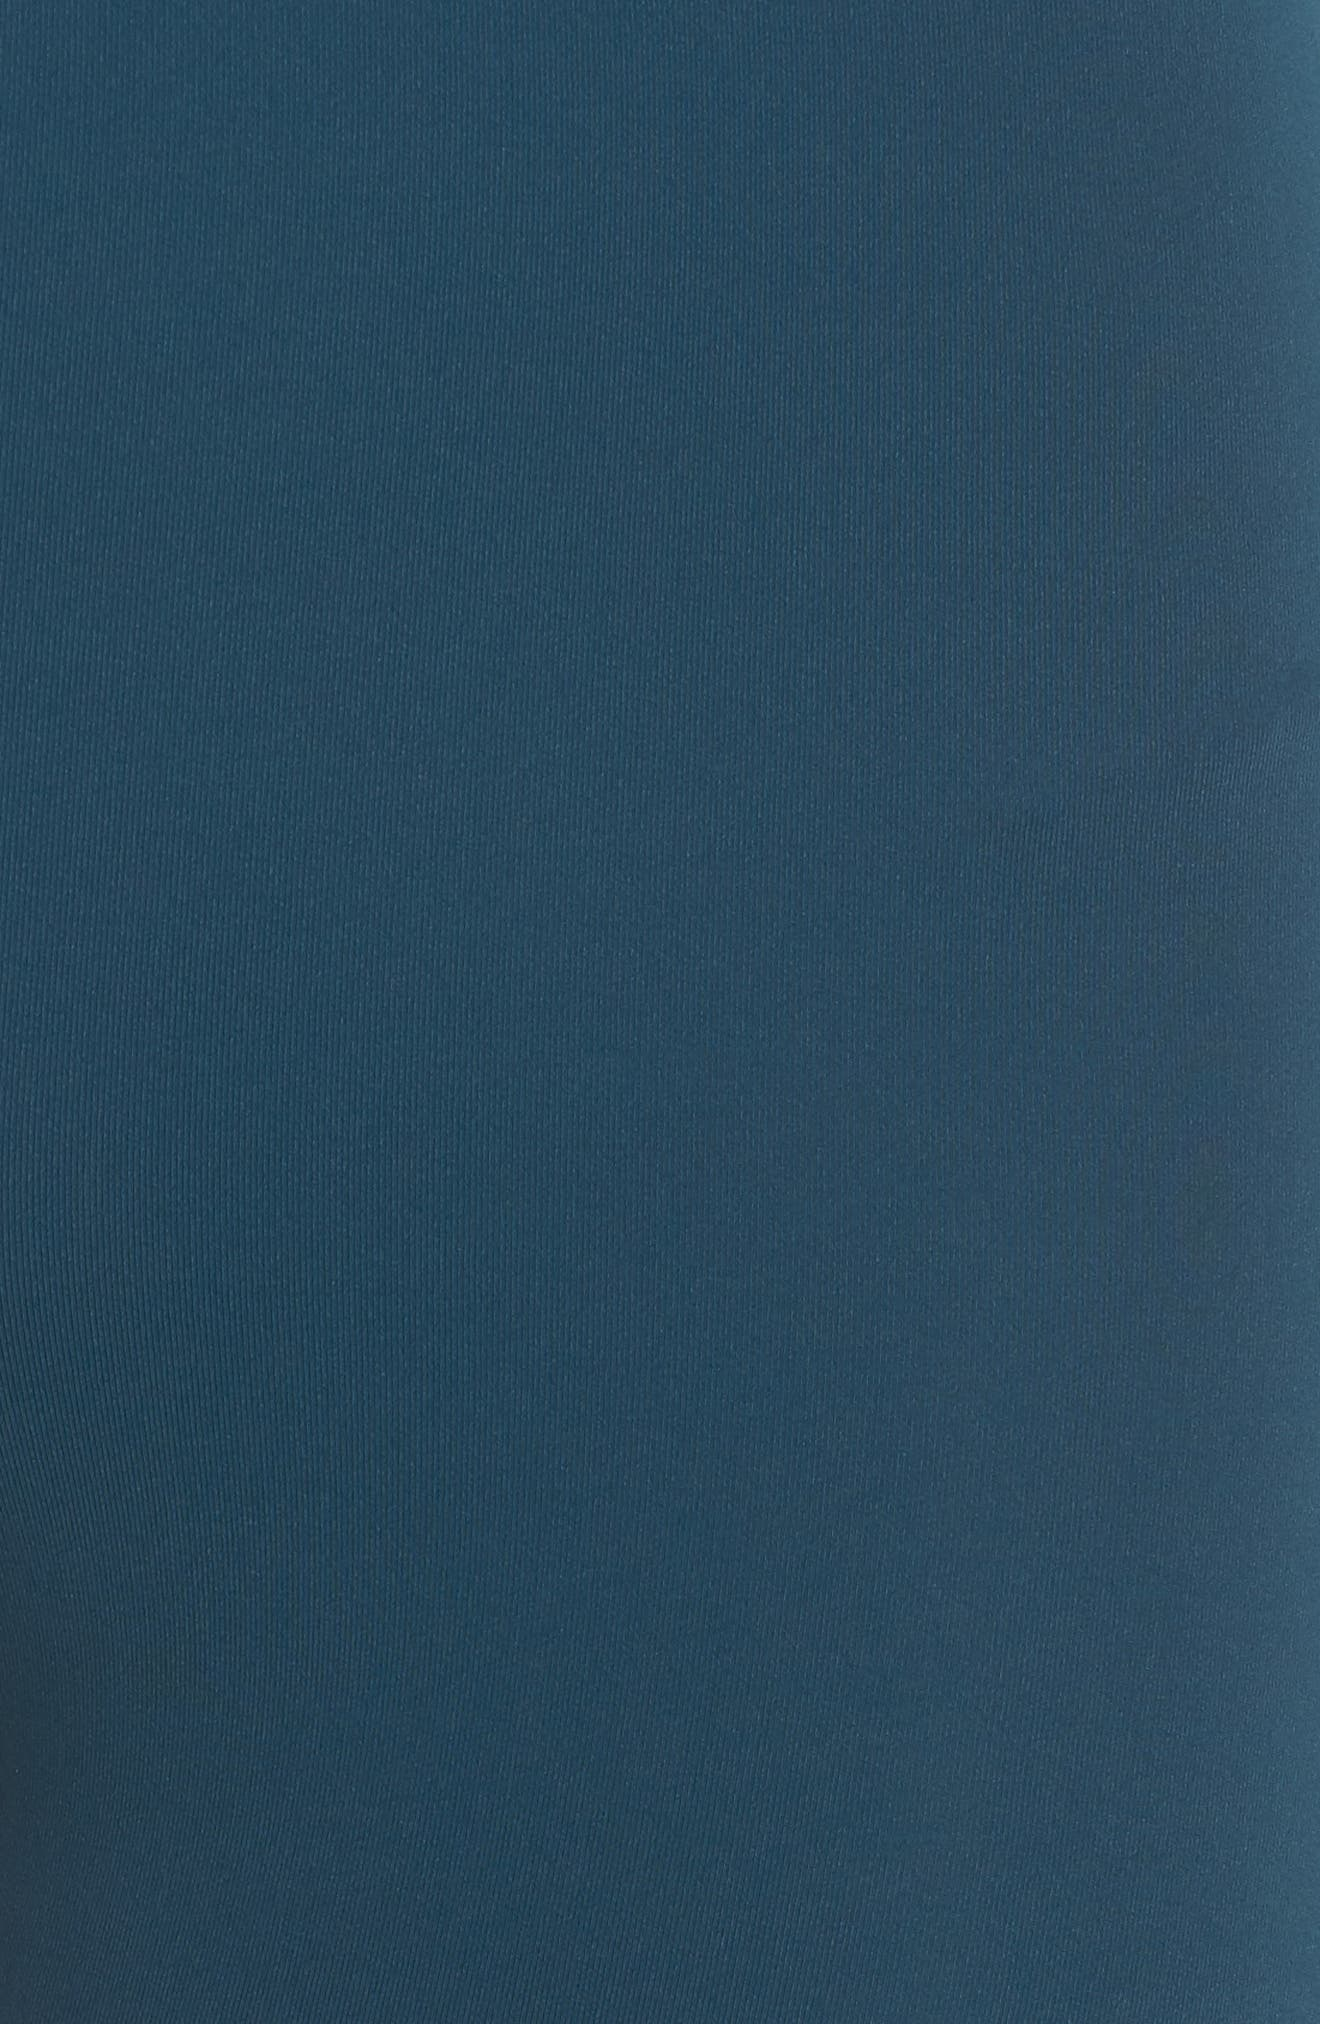 High Waist Stripe Ankle Leggings,                             Alternate thumbnail 6, color,                             TEAL ABYSS